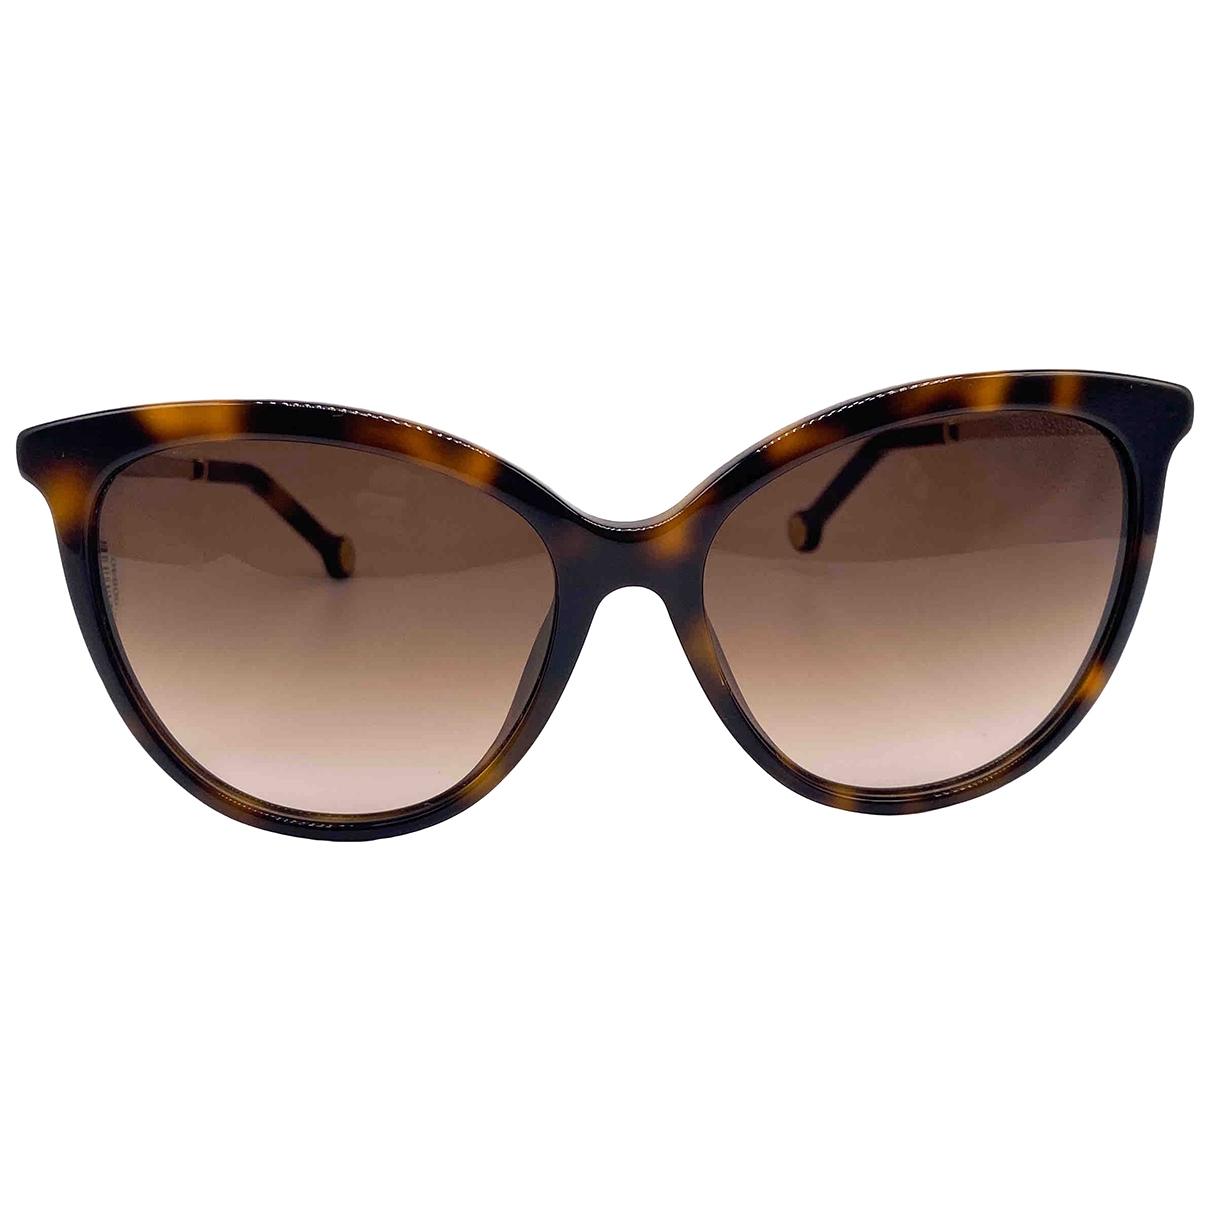 Carolina Herrera \N Brown Sunglasses for Women \N